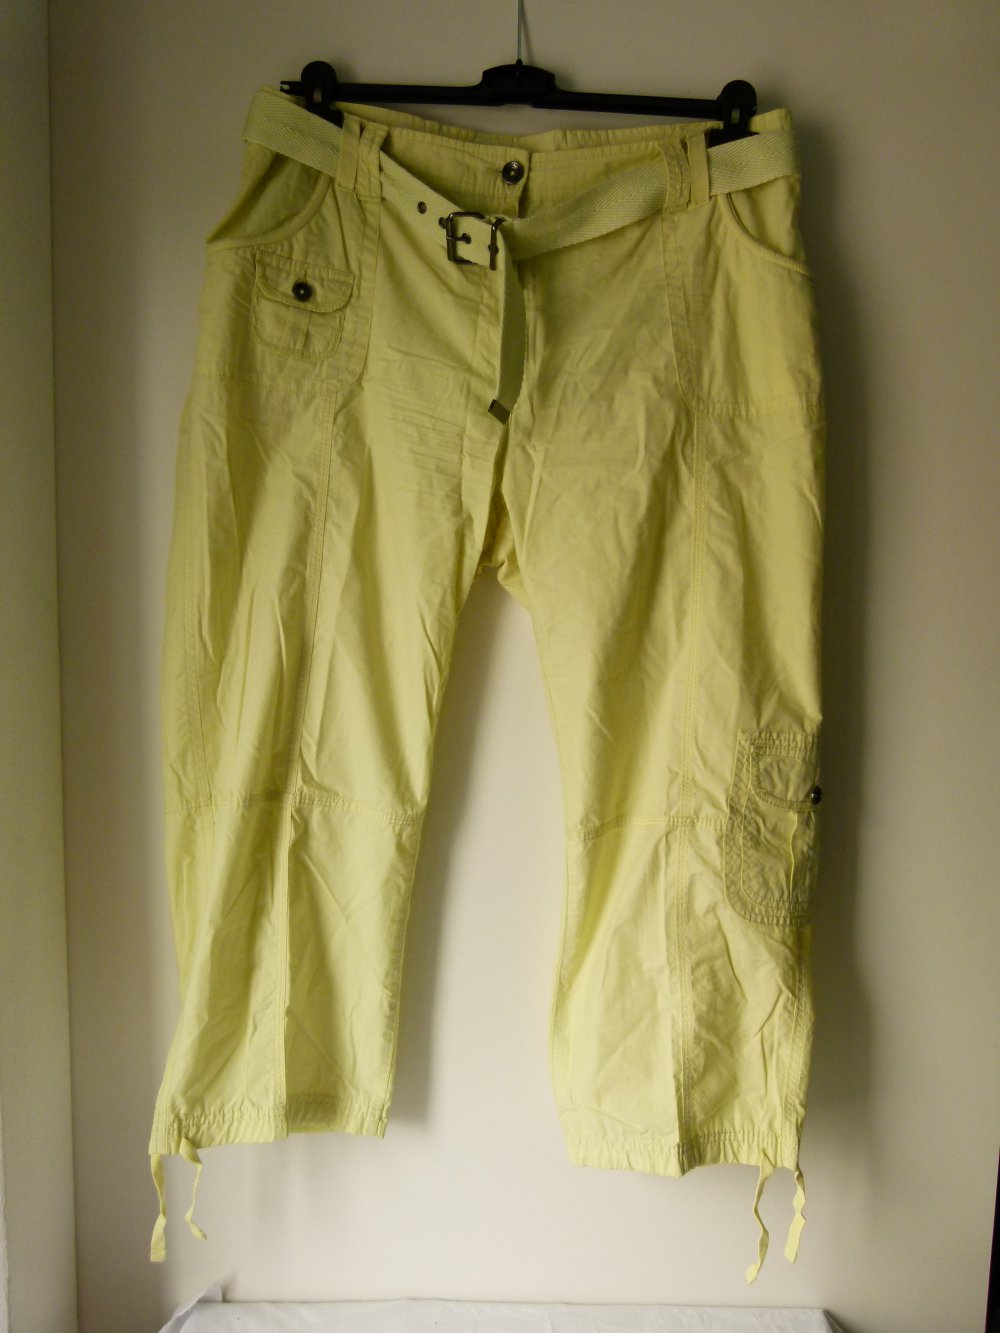 38 türkis kurze Hose Damen Shorts Gr goldenem Gürtel Sommerhose NEU